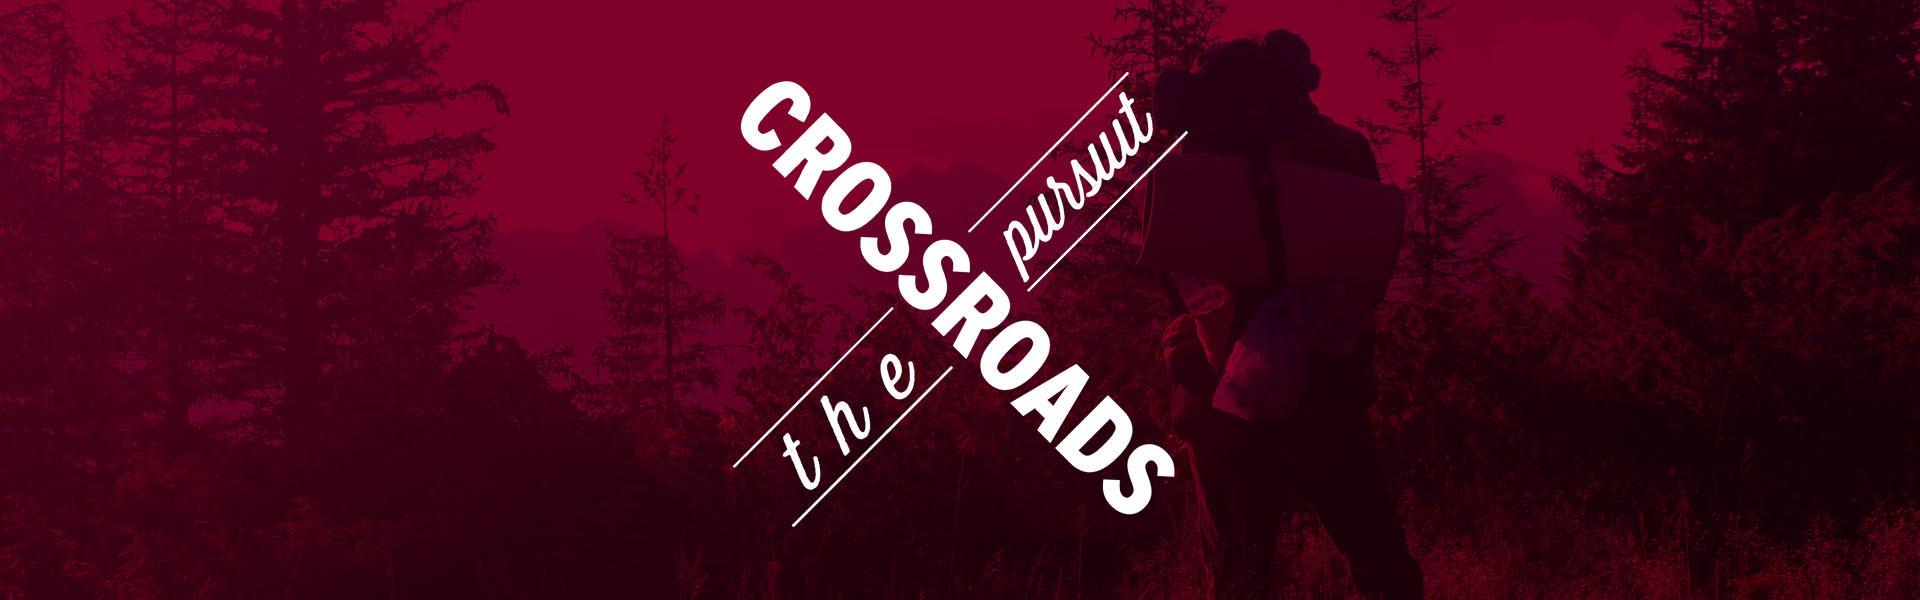 Crossroads Pursuit blog